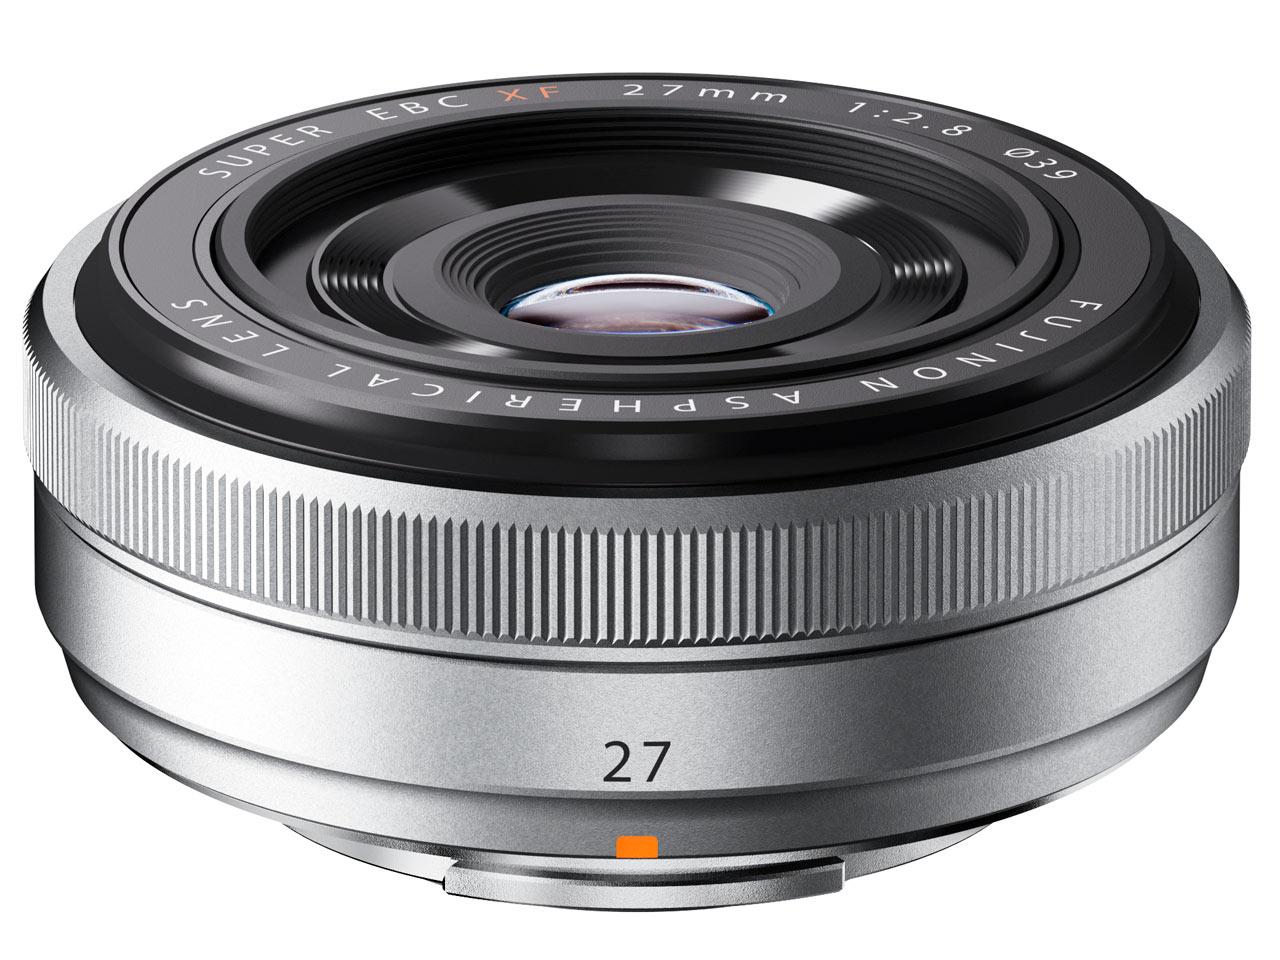 Fujifilm XF 27mm F2.8 'pancake' lens | Digital Photography Live